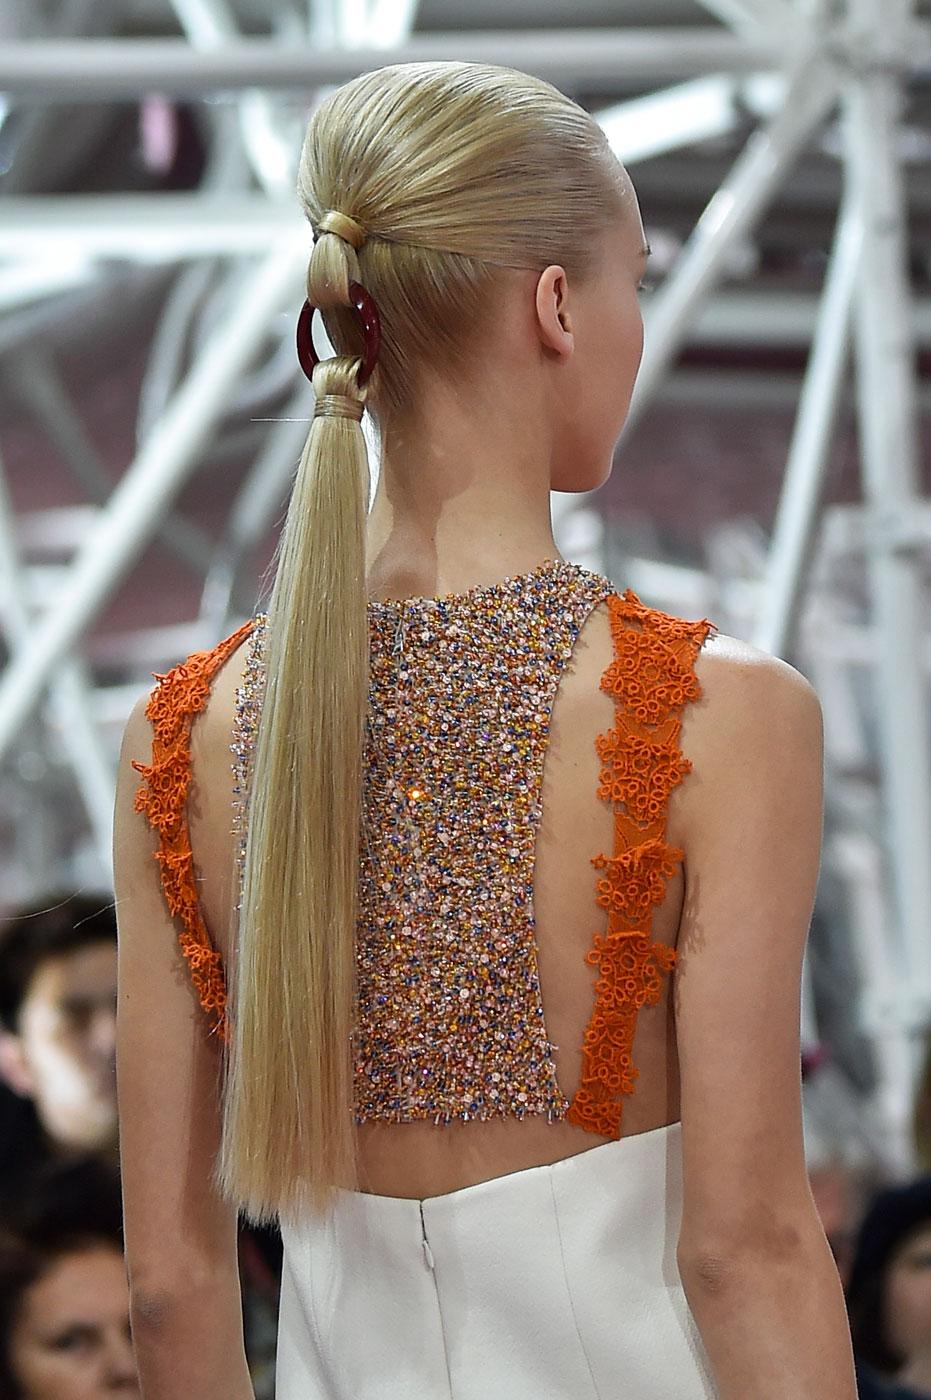 Christian-Dior-fashion-runway-show-close-ups-haute-couture-paris-spring-summer-2015-the-impression-061